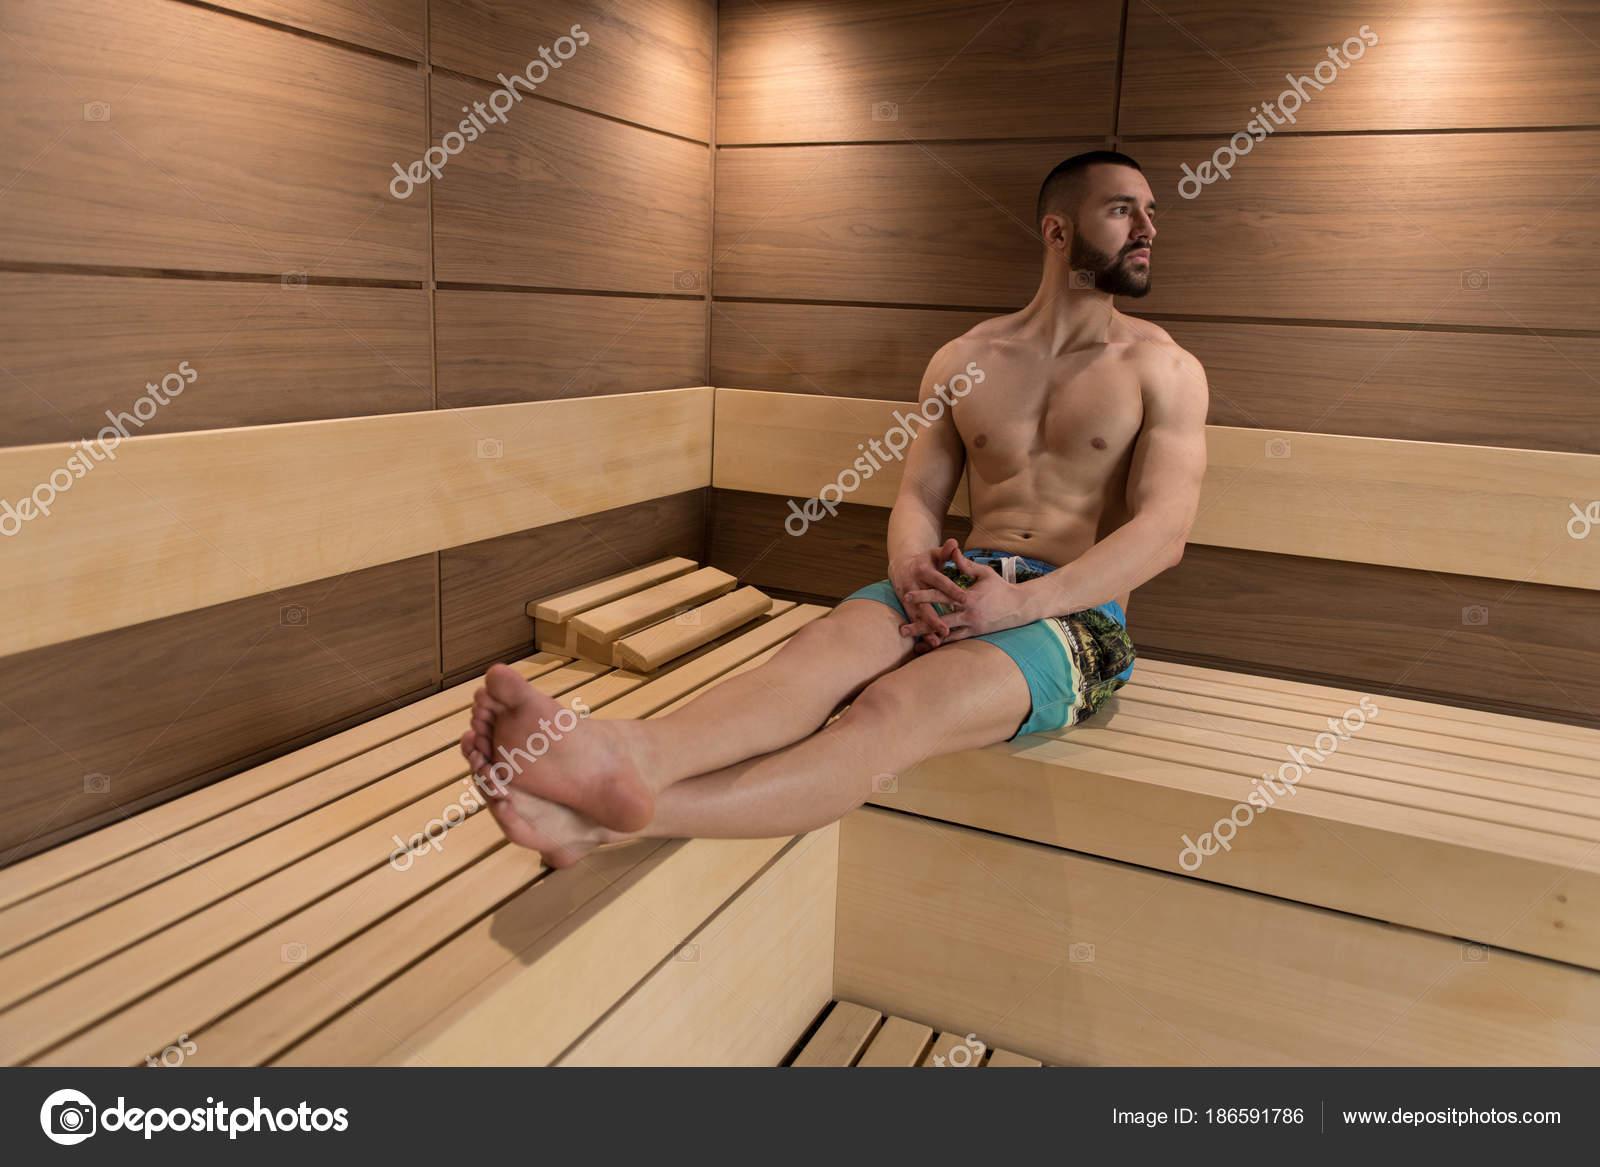 Футболисты в сауне, Жена Глушакова: Застала Дениса в бане с любовницей 26 фотография